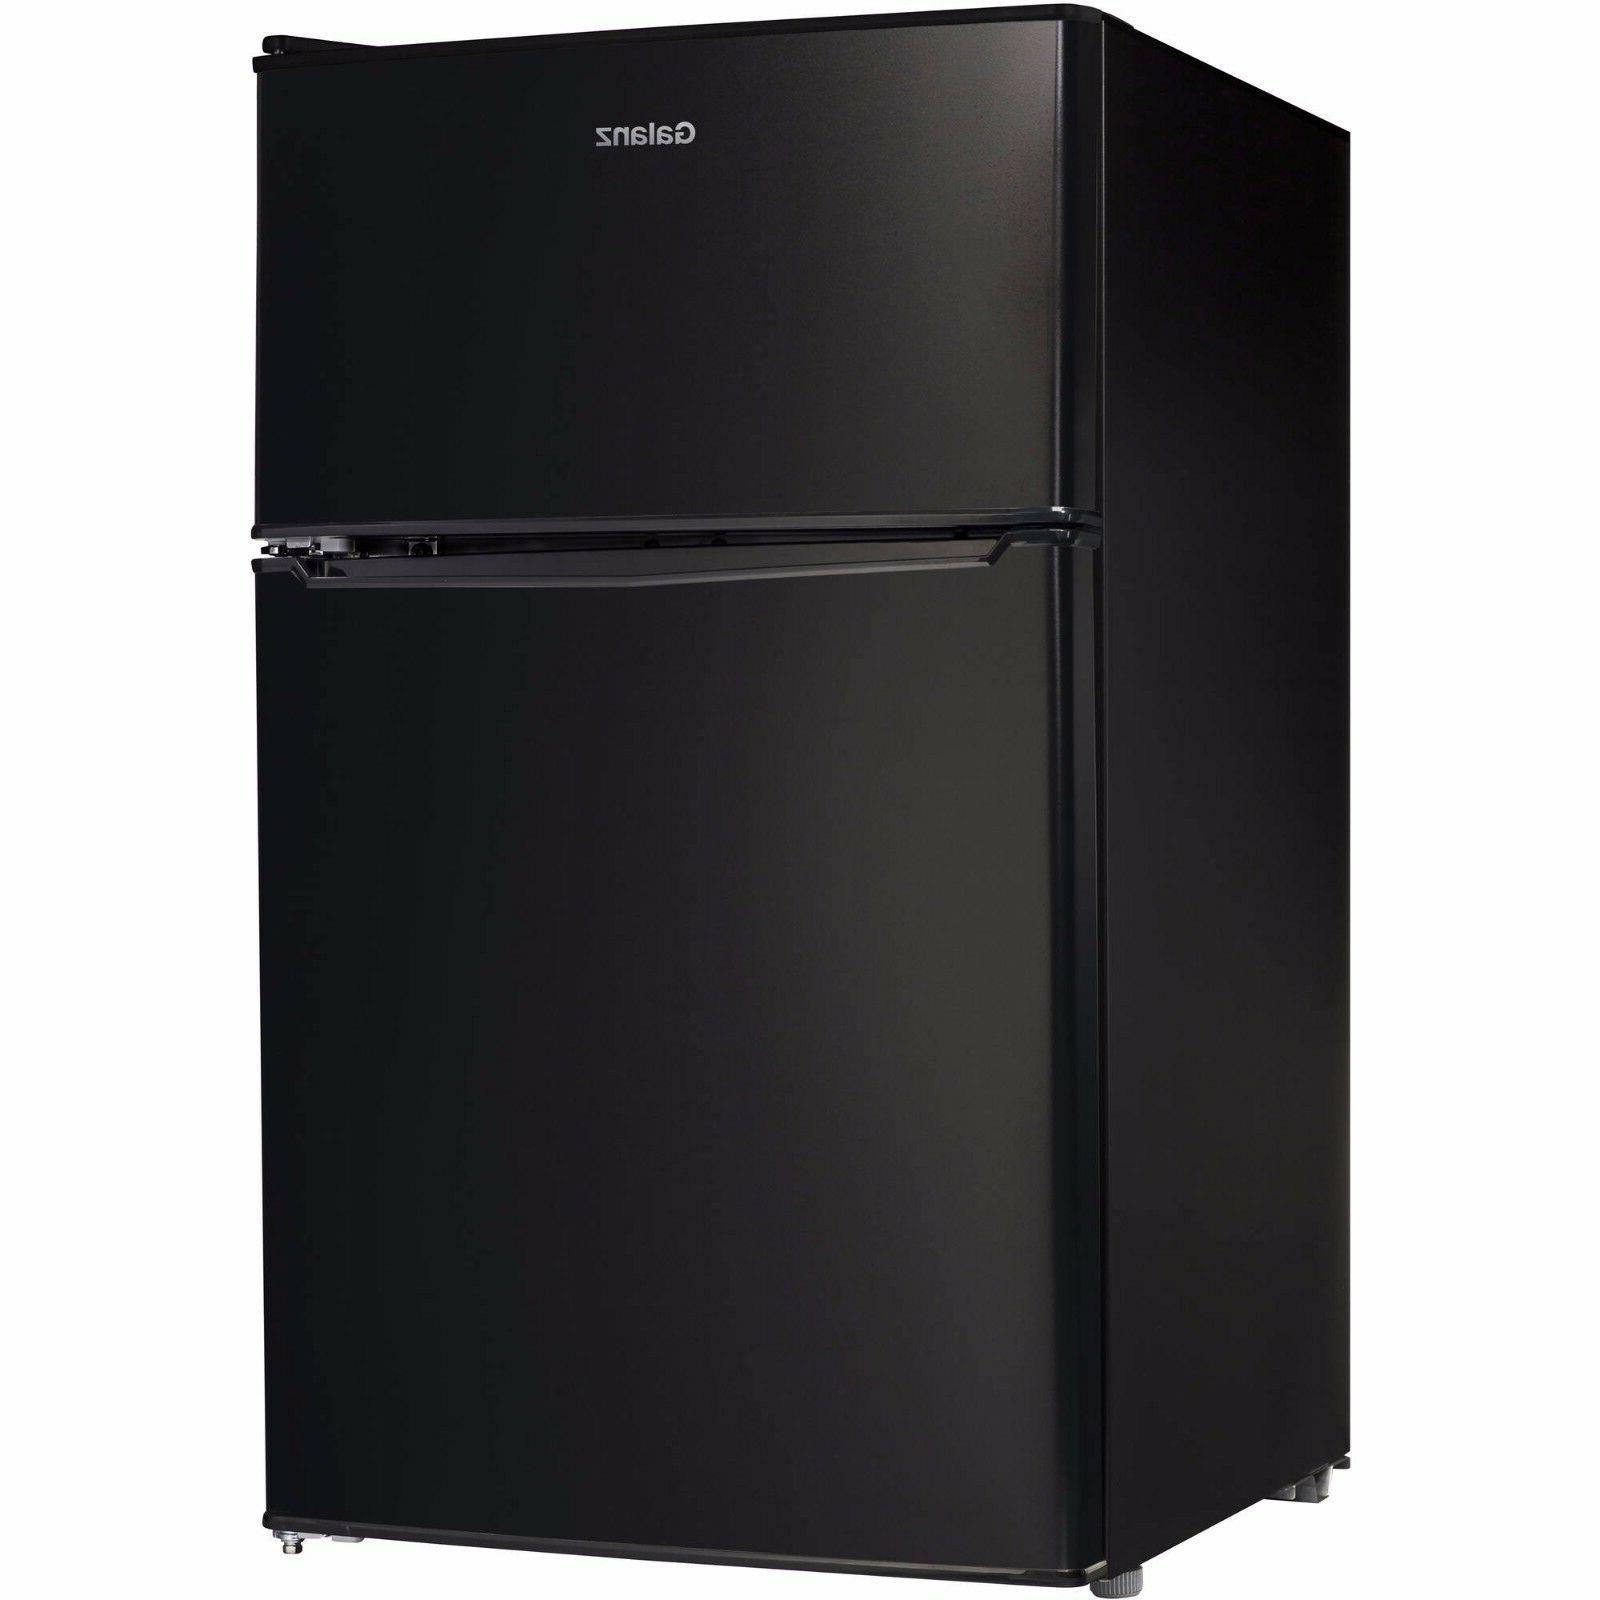 3 1 cu ft compact refrigerator double